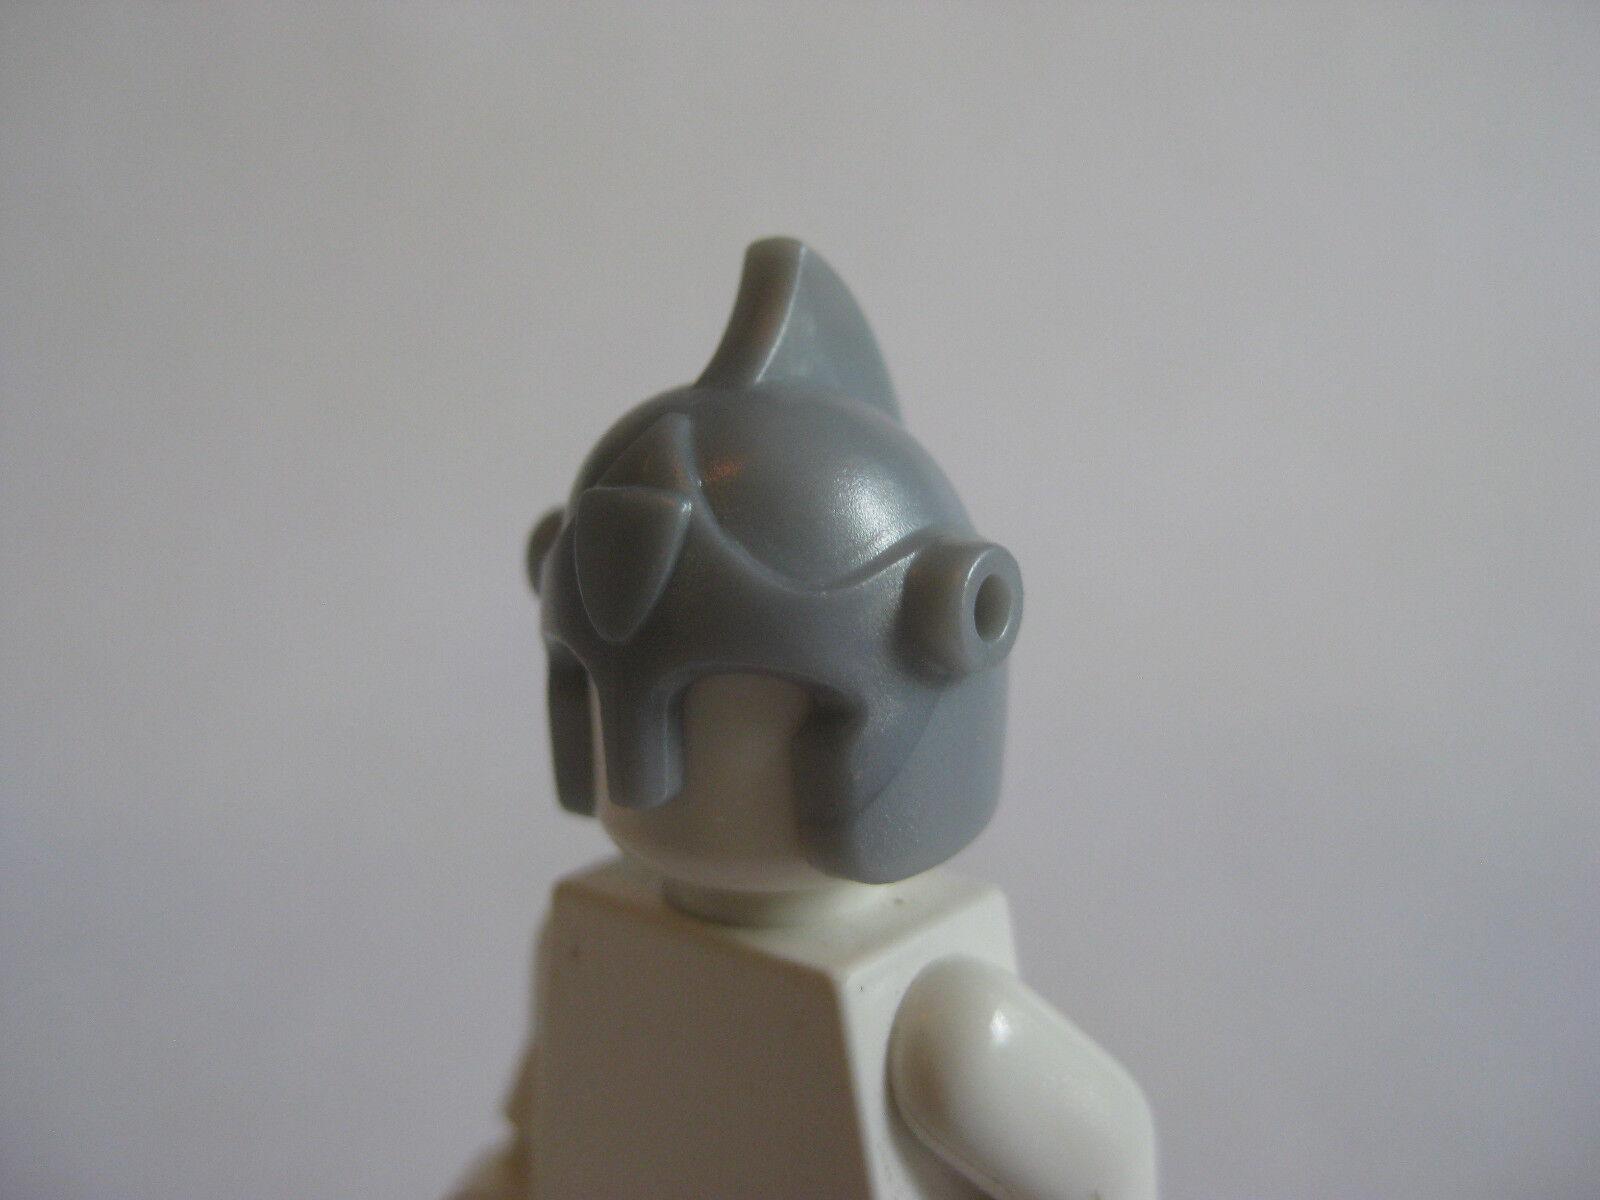 Custom HELMET Warrior Helm Crown for Lego Minifigures LOTR Knight King Castle